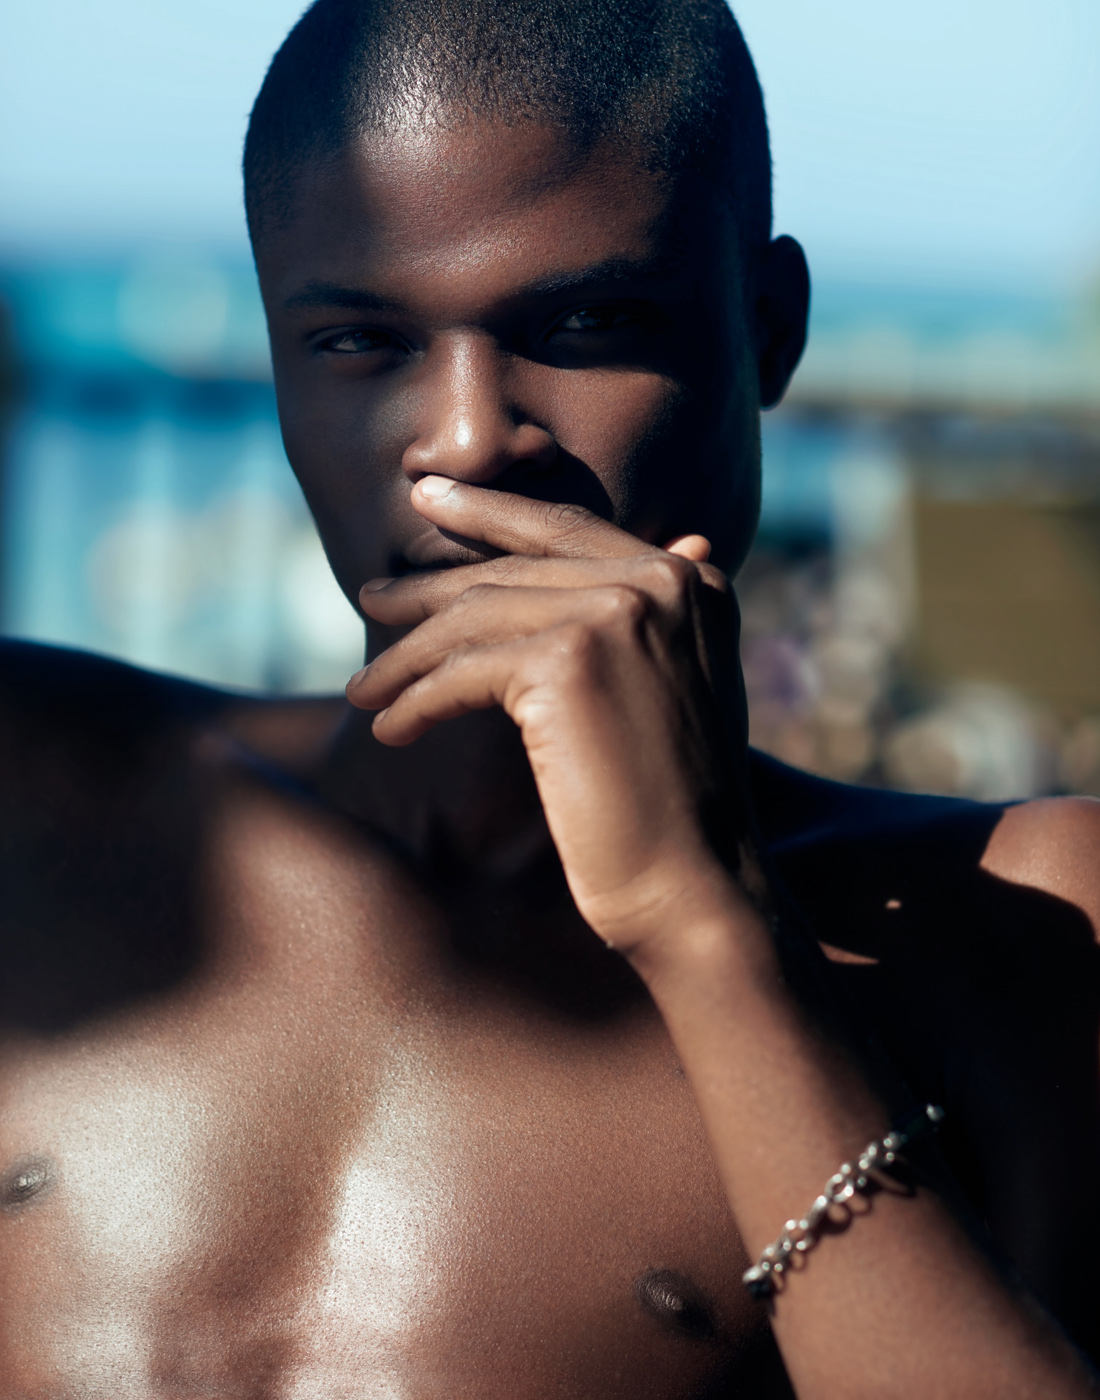 Caribbean Stay Editorials  swimwear photoshooting photography models model Marcus Turner lionsmag lions magazine fashion model fashion editorial bikini beachwear   // lionsmag.com - premium nude photography magazine